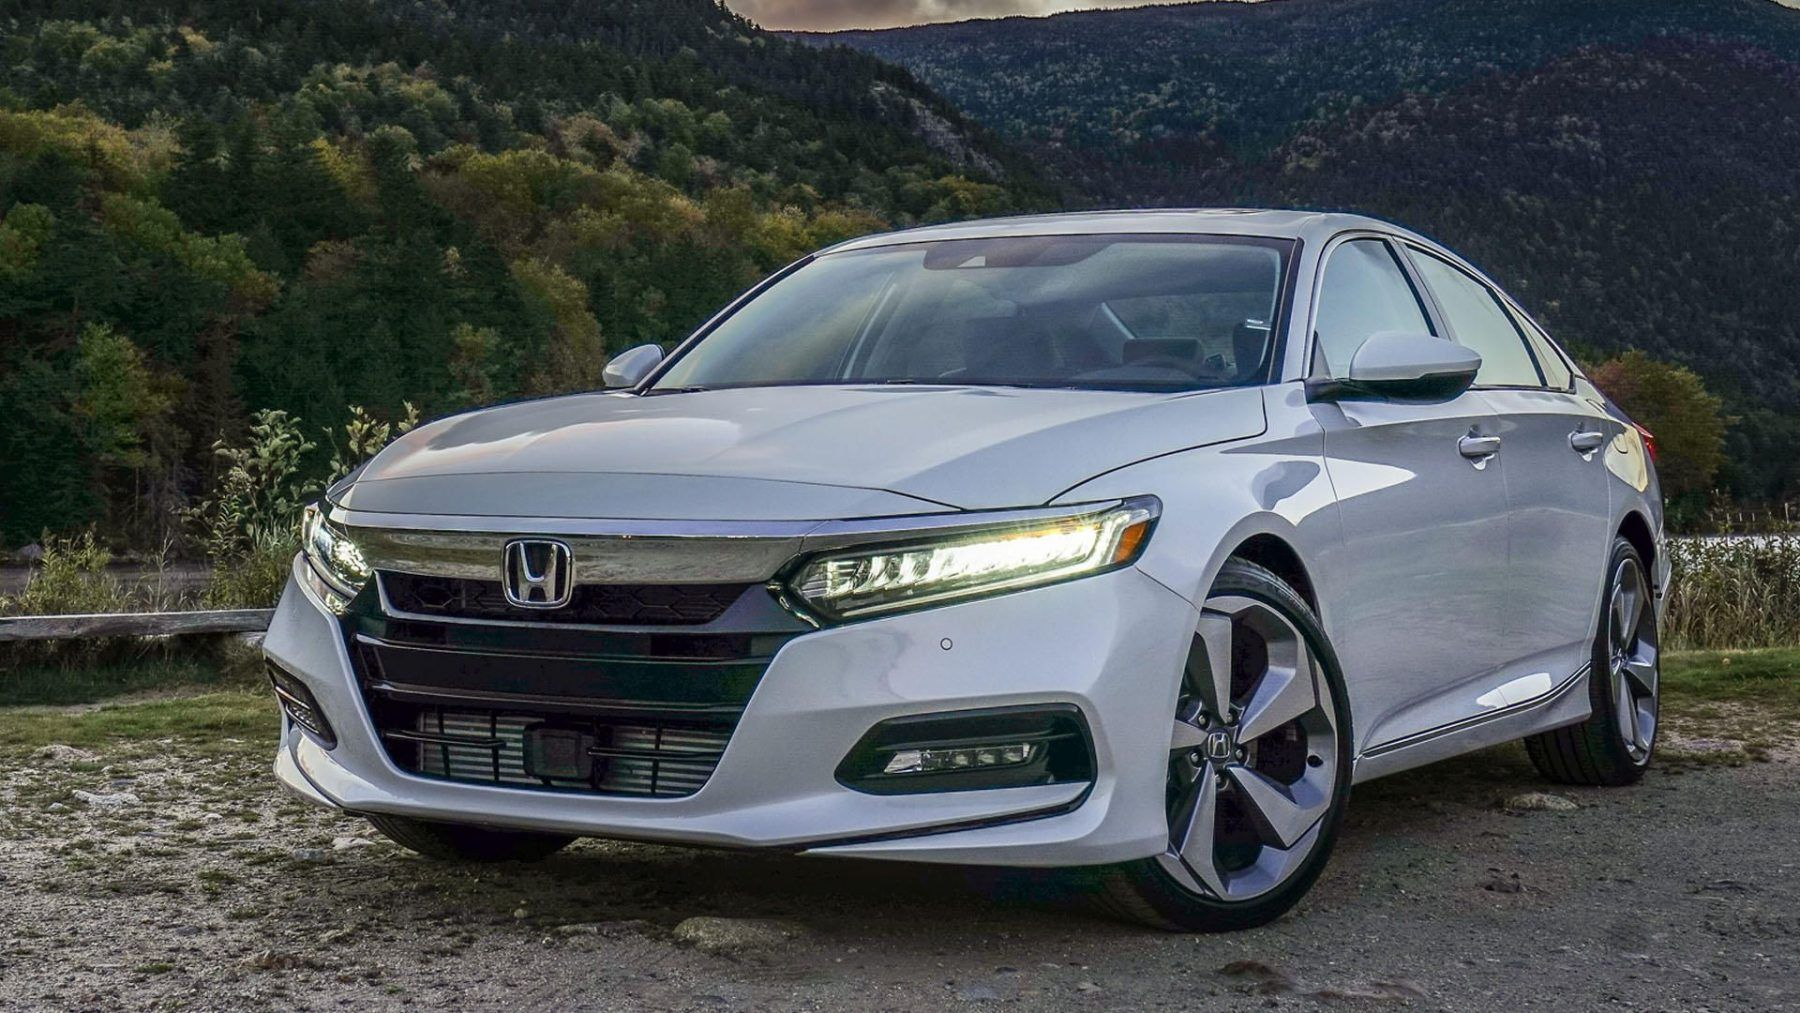 Honda Accord 2019 Price Honda accord, Honda accord